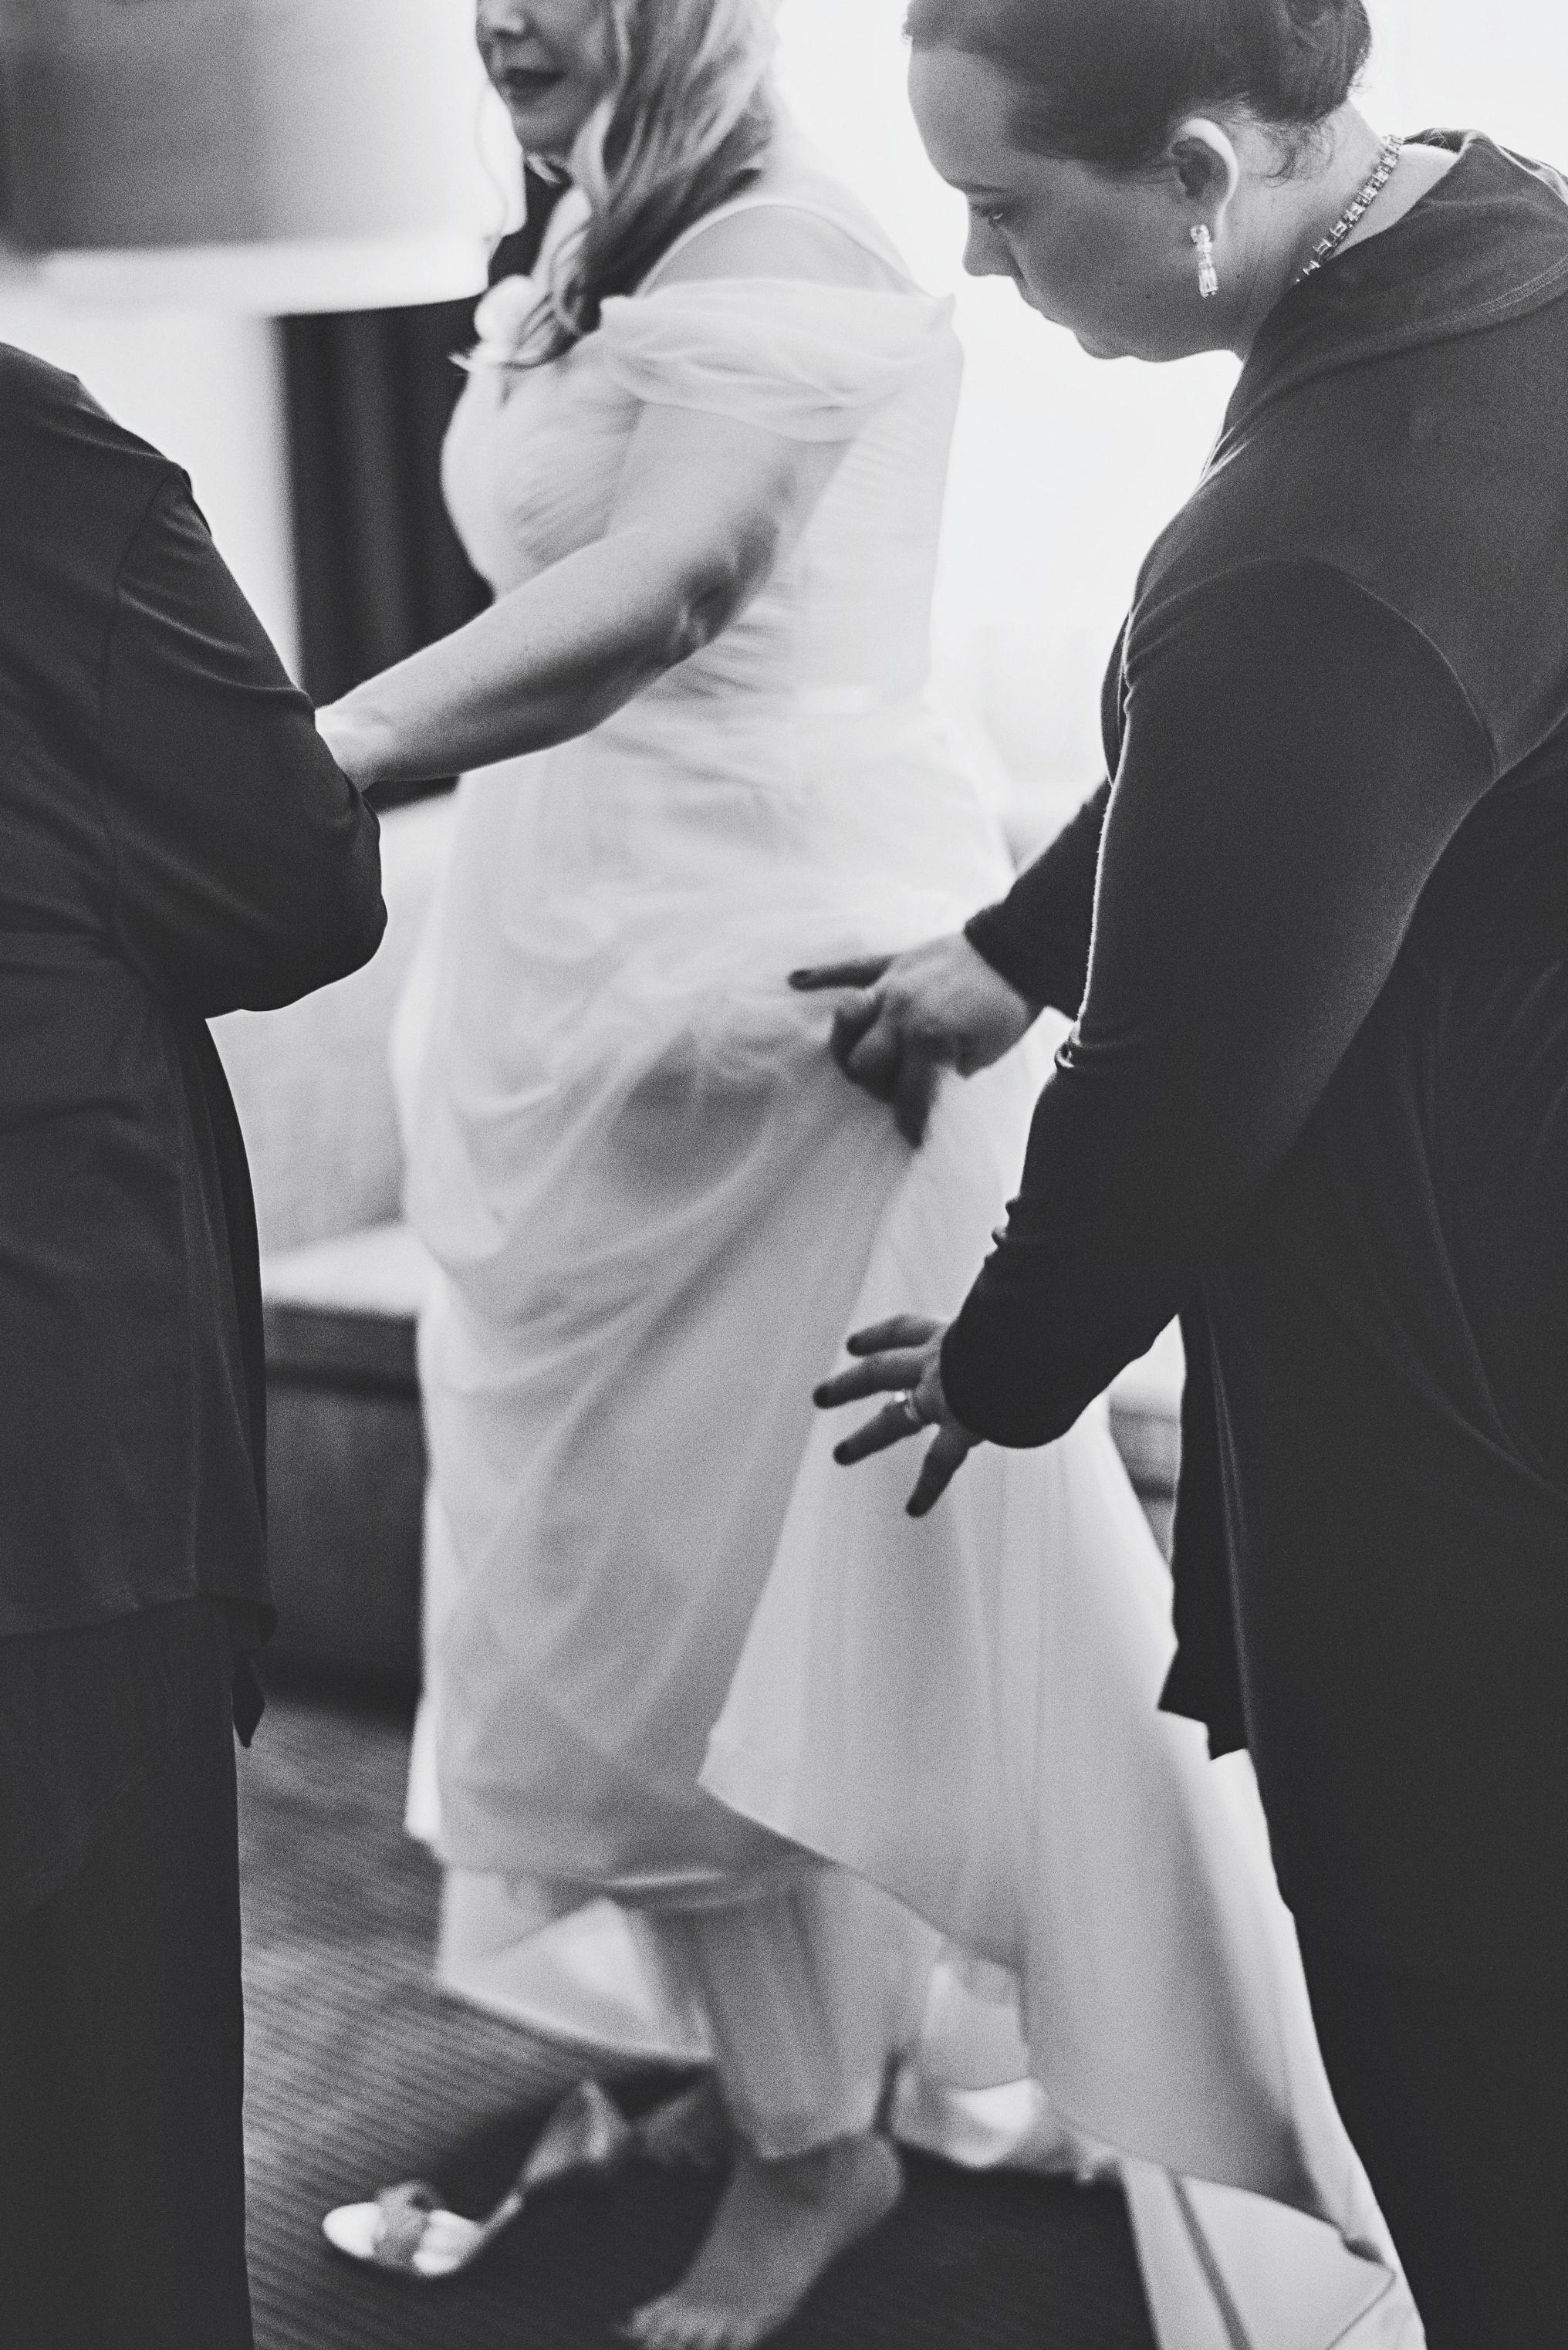 best_wedding_photography_2017_by_lucas_botz_photography_024.jpg